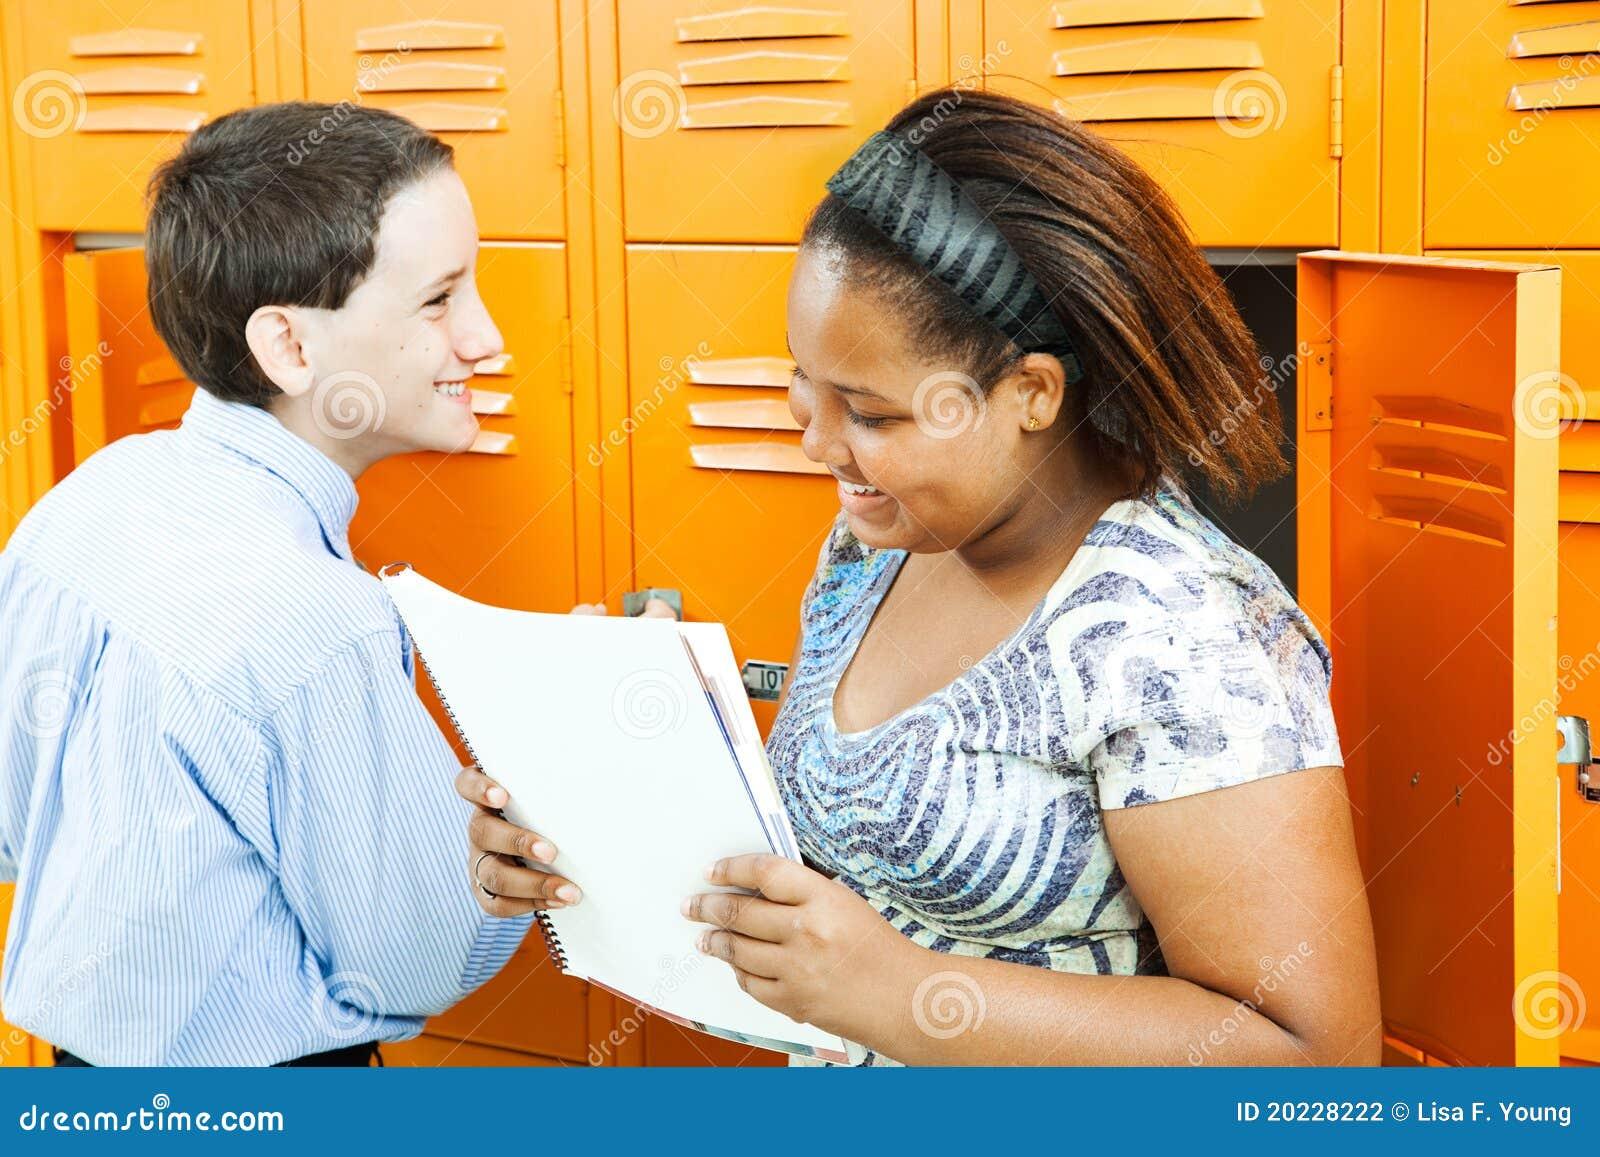 School Kids Talking By Lockers Stock Photography - Image ...